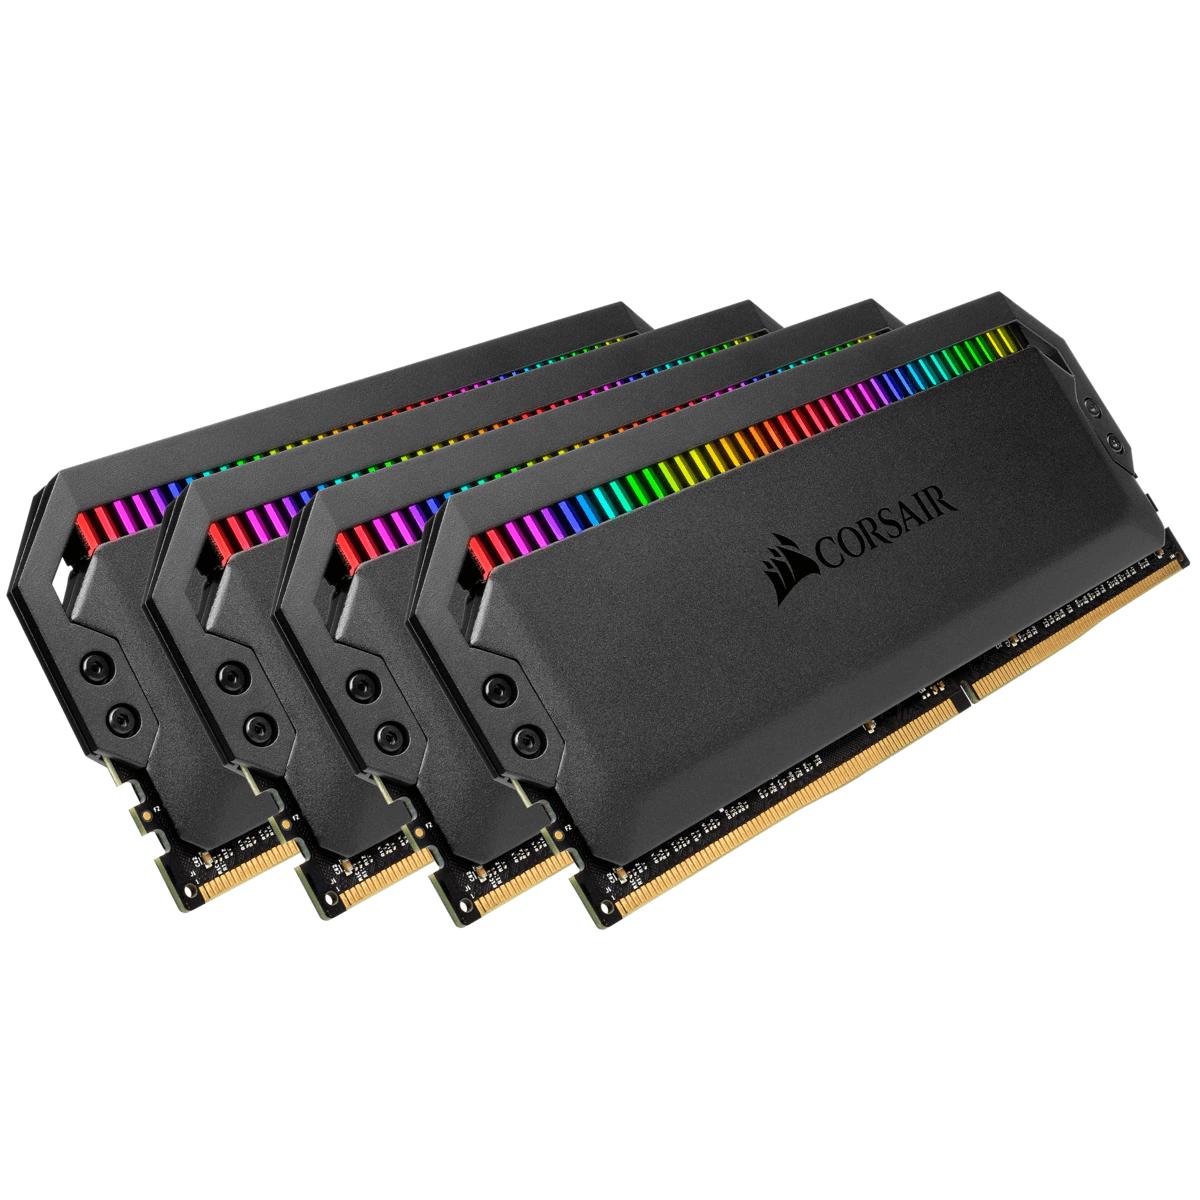 Memória DDR4 Corsair Dominator Platinum RGB, 32GB (4x8GB), 3000MHz, CMT32GX4M4C3000C15